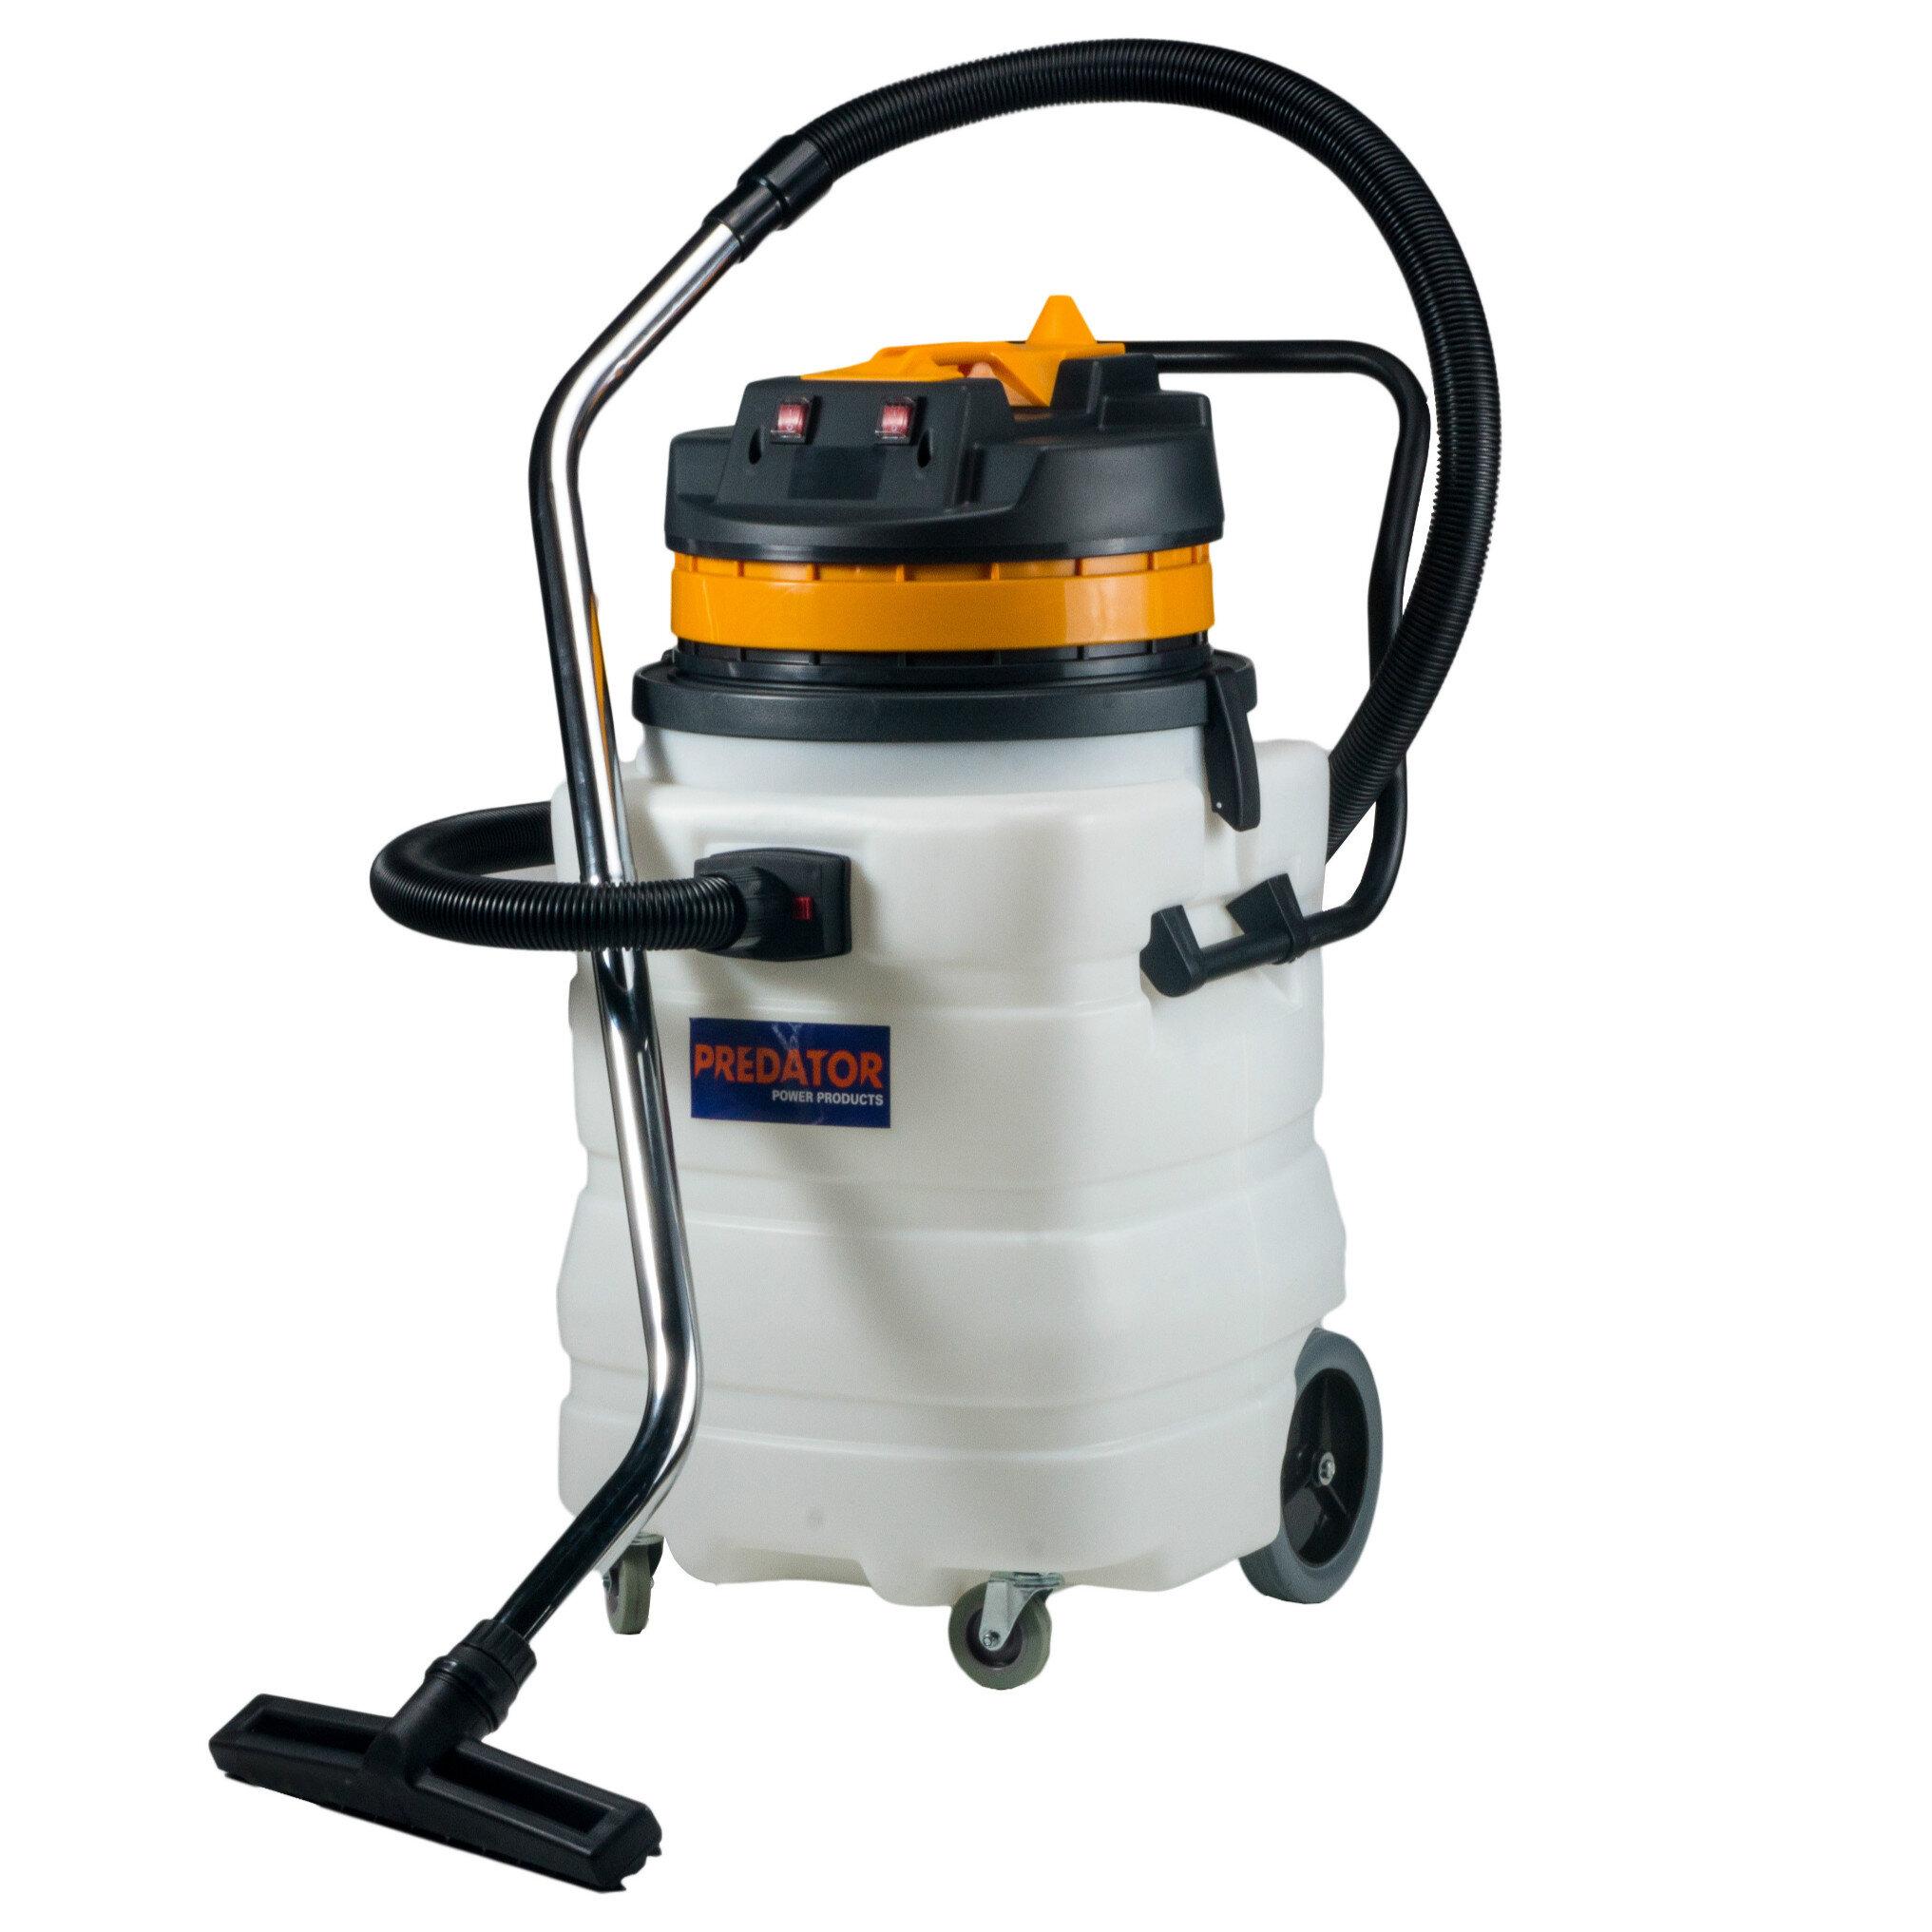 PREDATOR INDUSTRIAL WET/DRY VACUUM CLEANER110V